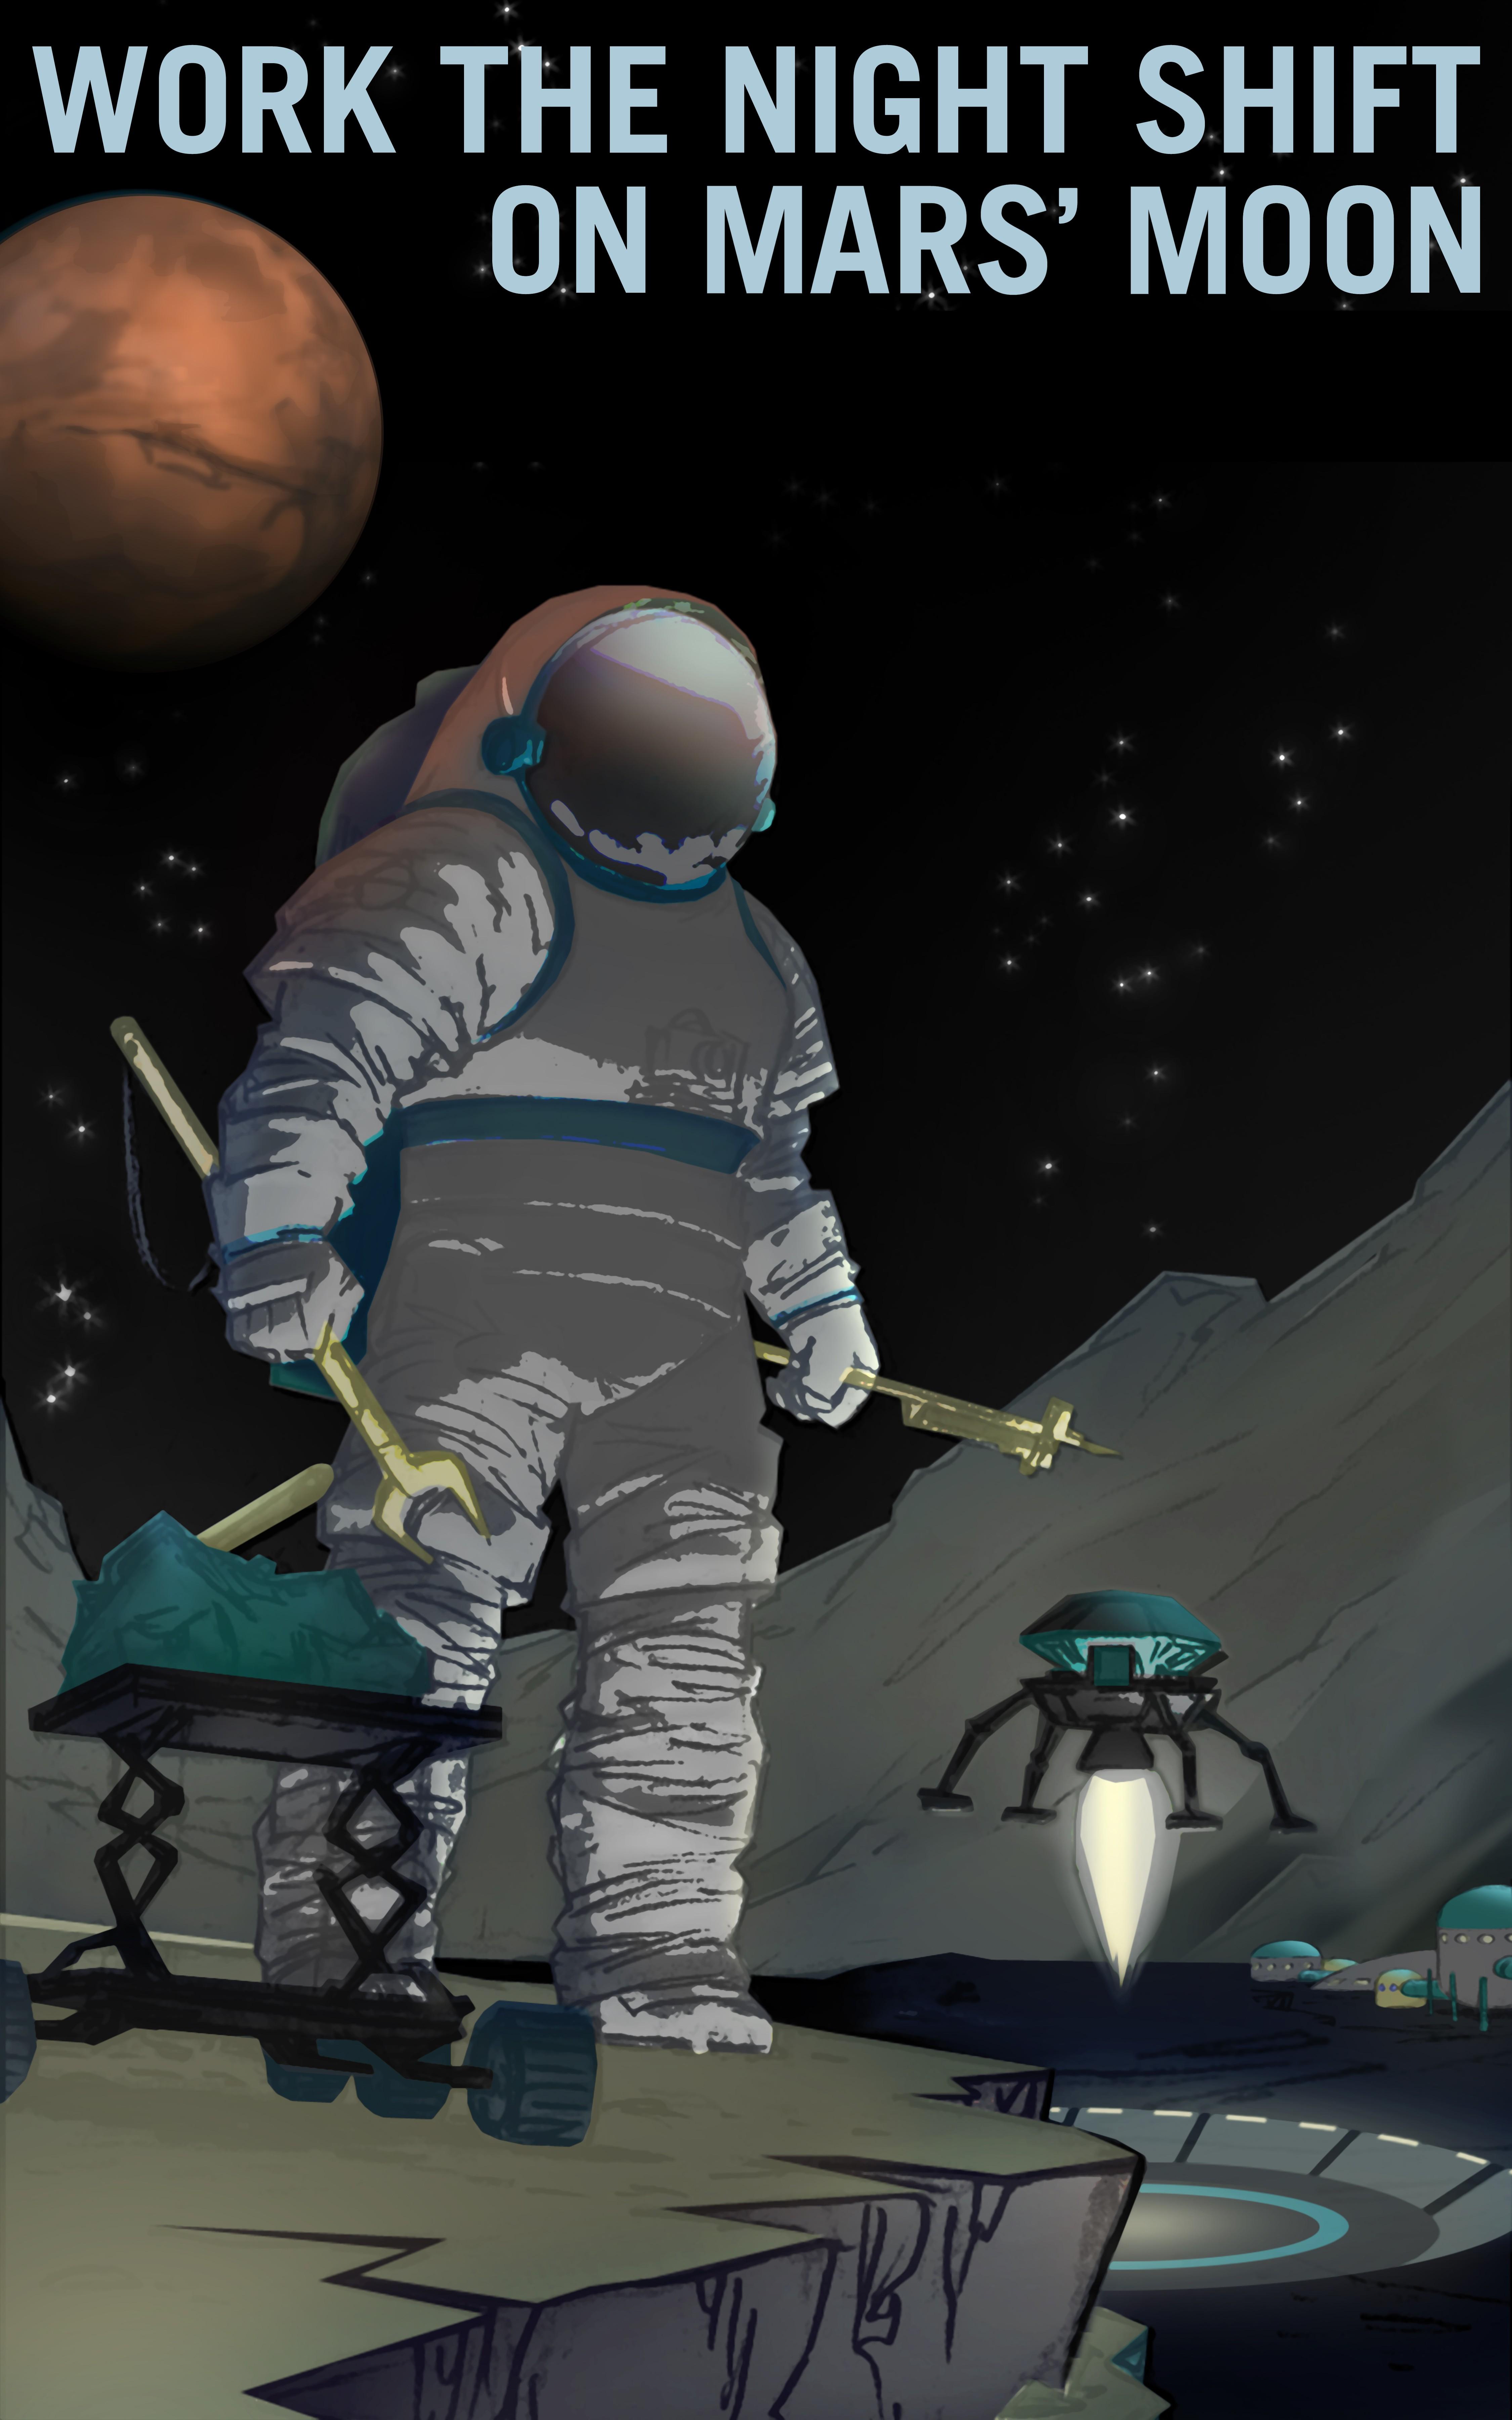 (Foto: NASA/KSC)